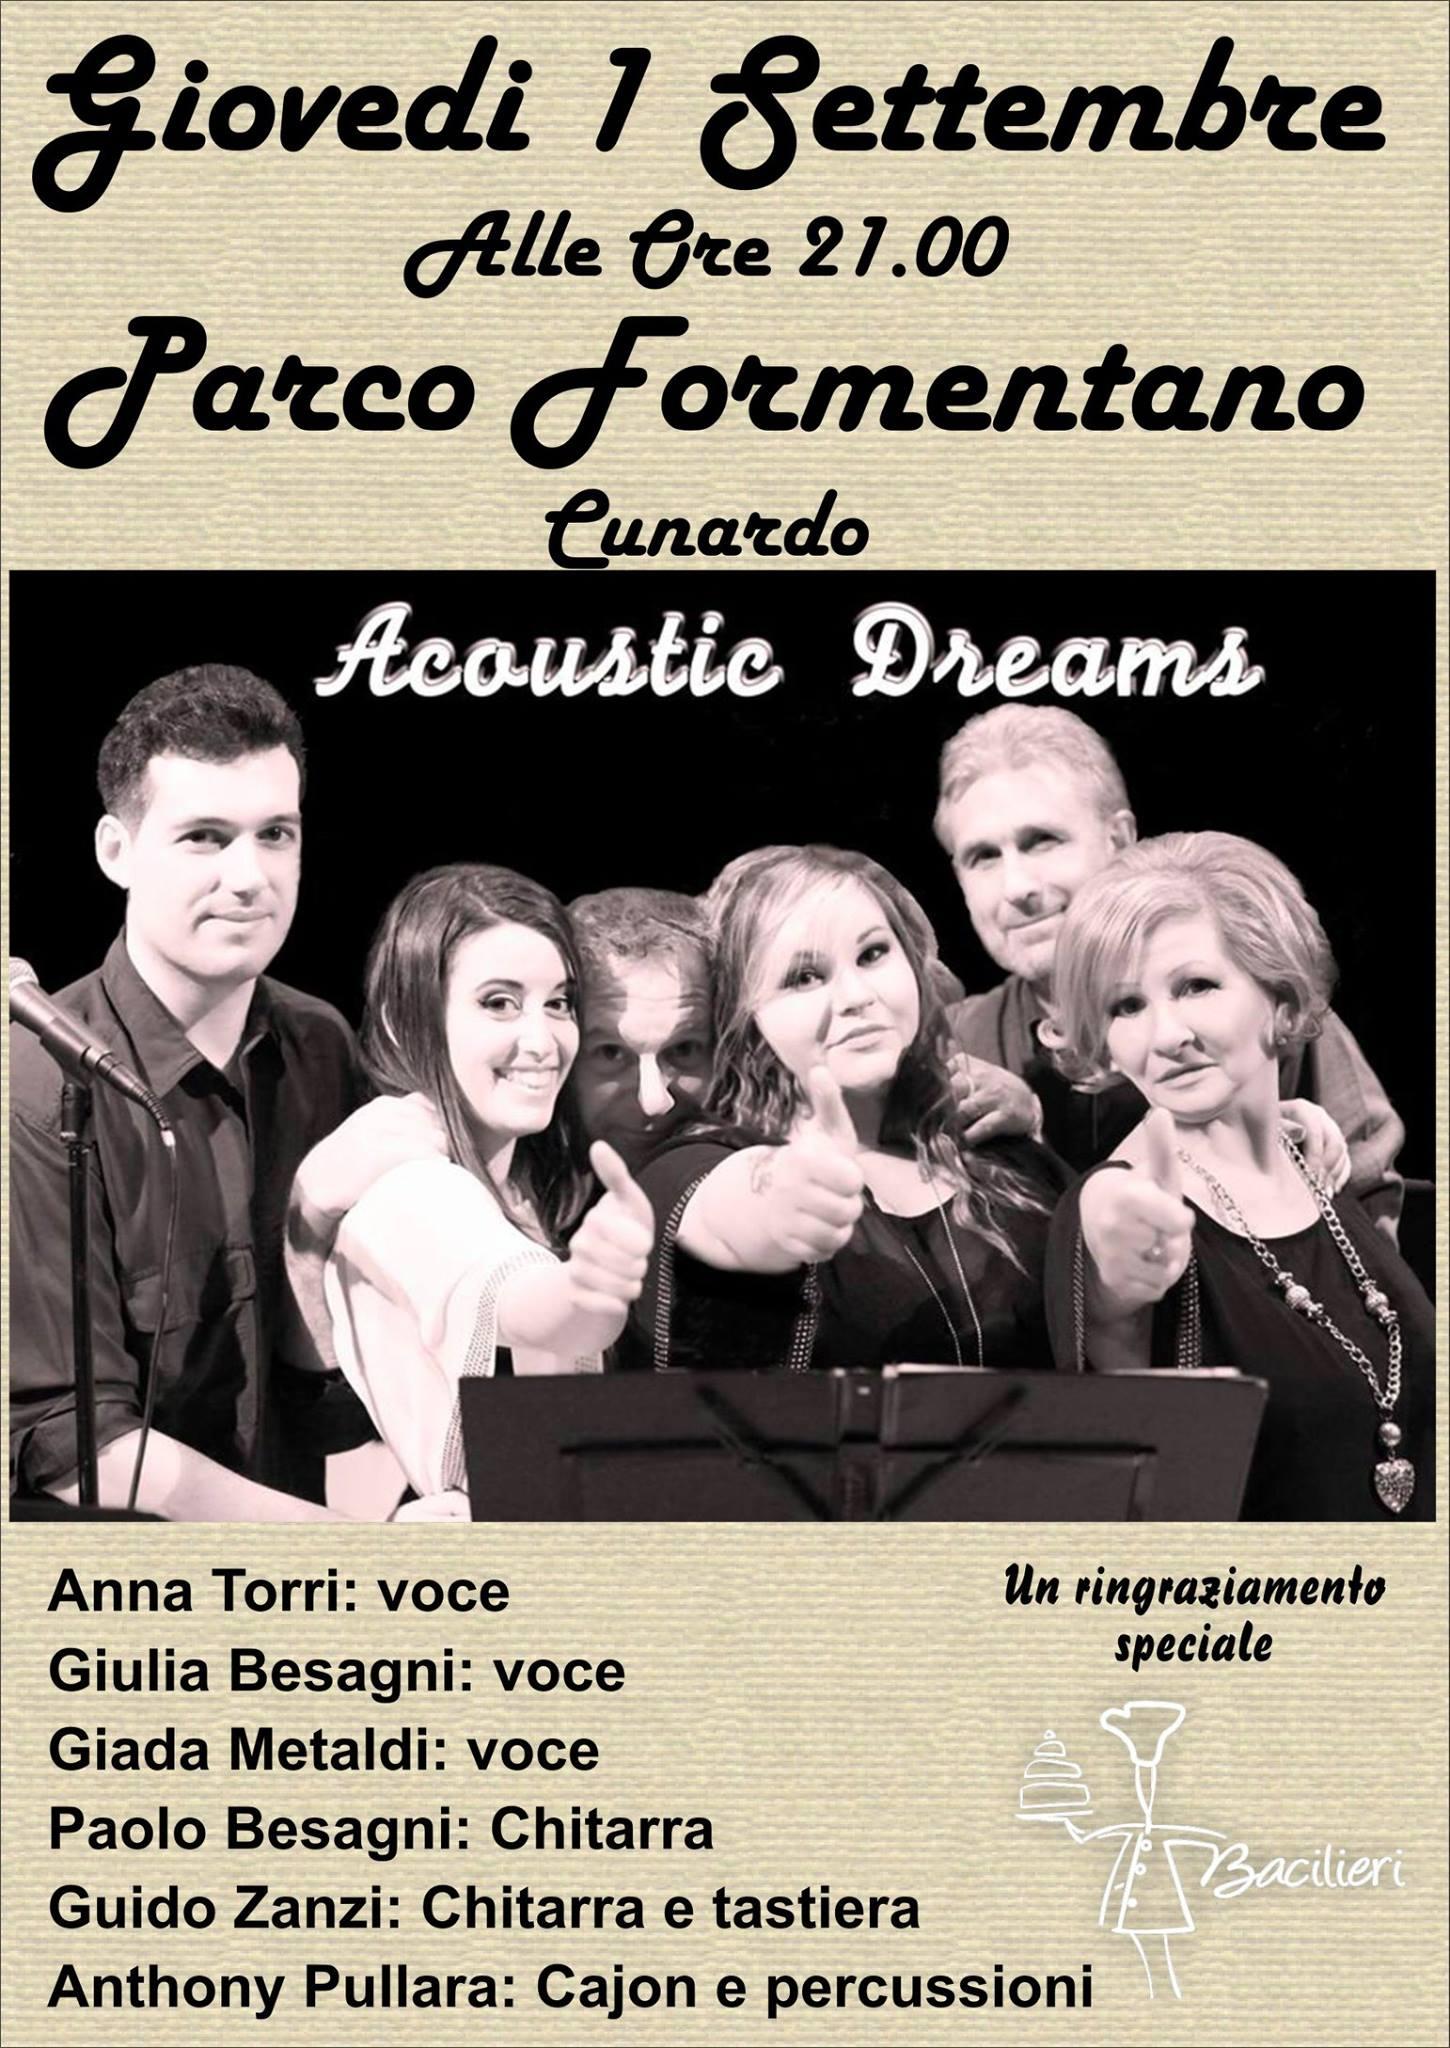 Cunardo, Acoustic Dreams in concerto per i terremotat